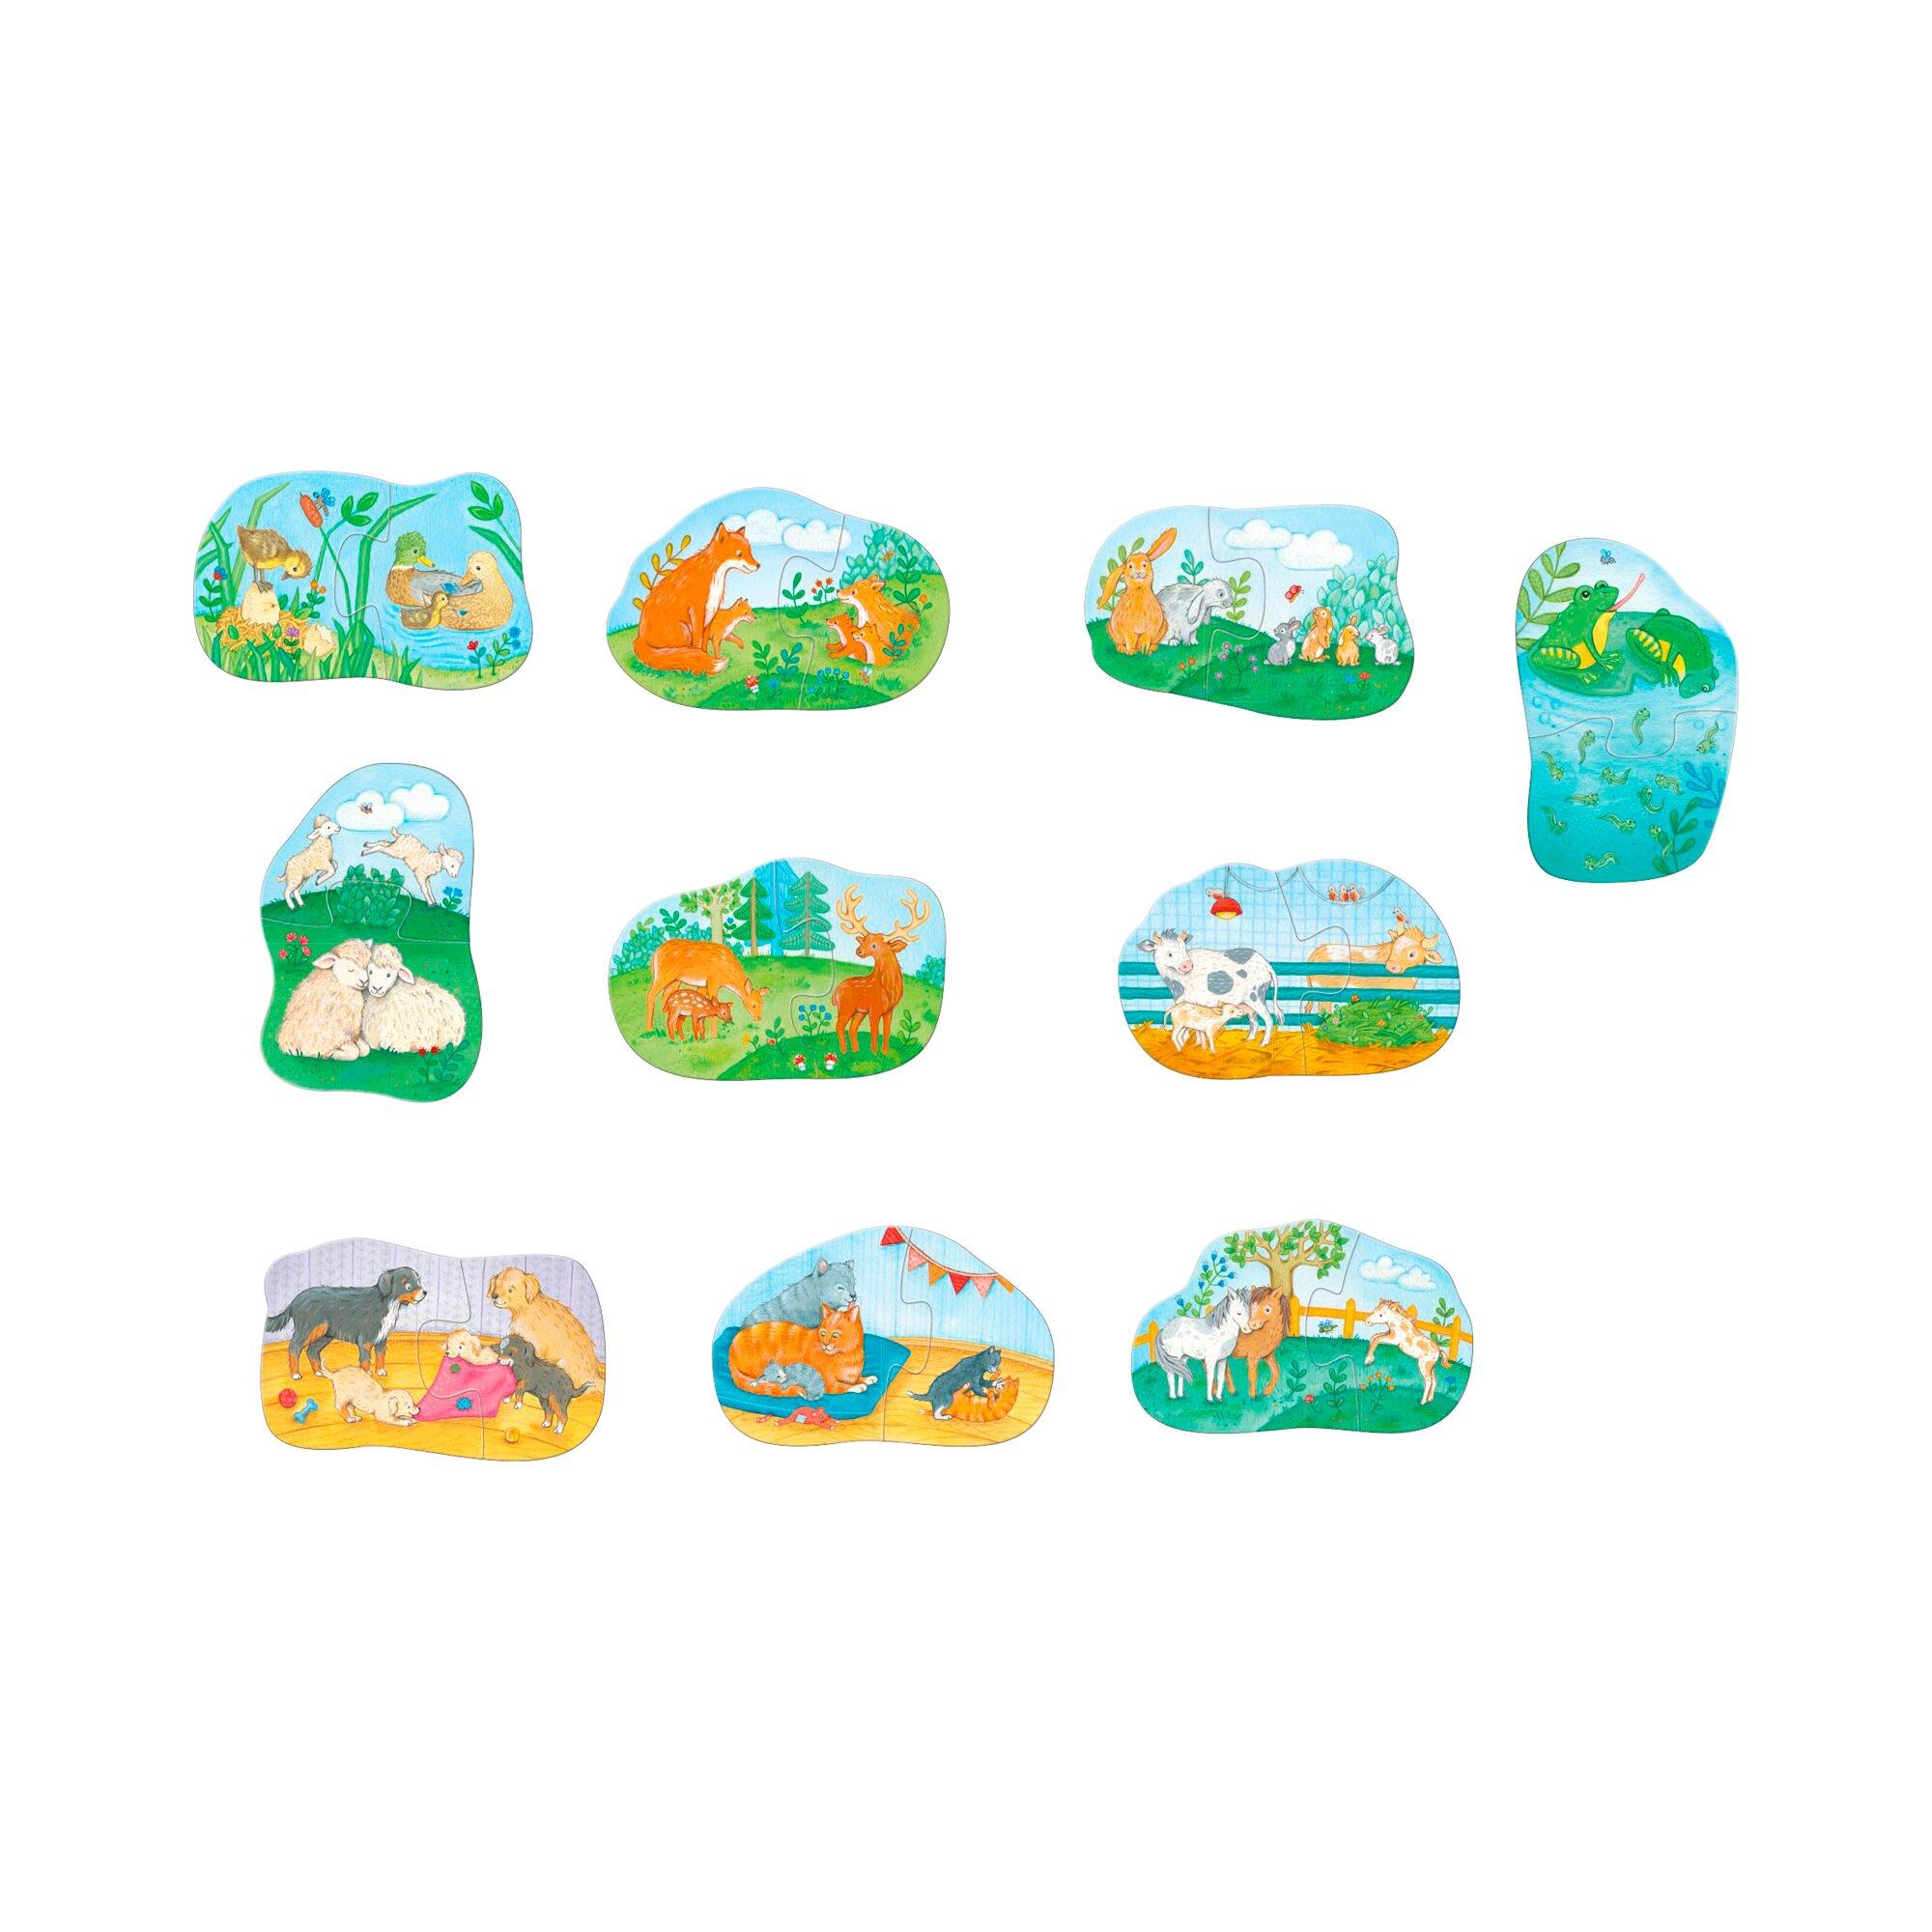 haba-1-2-puzzelei-tierfamilien